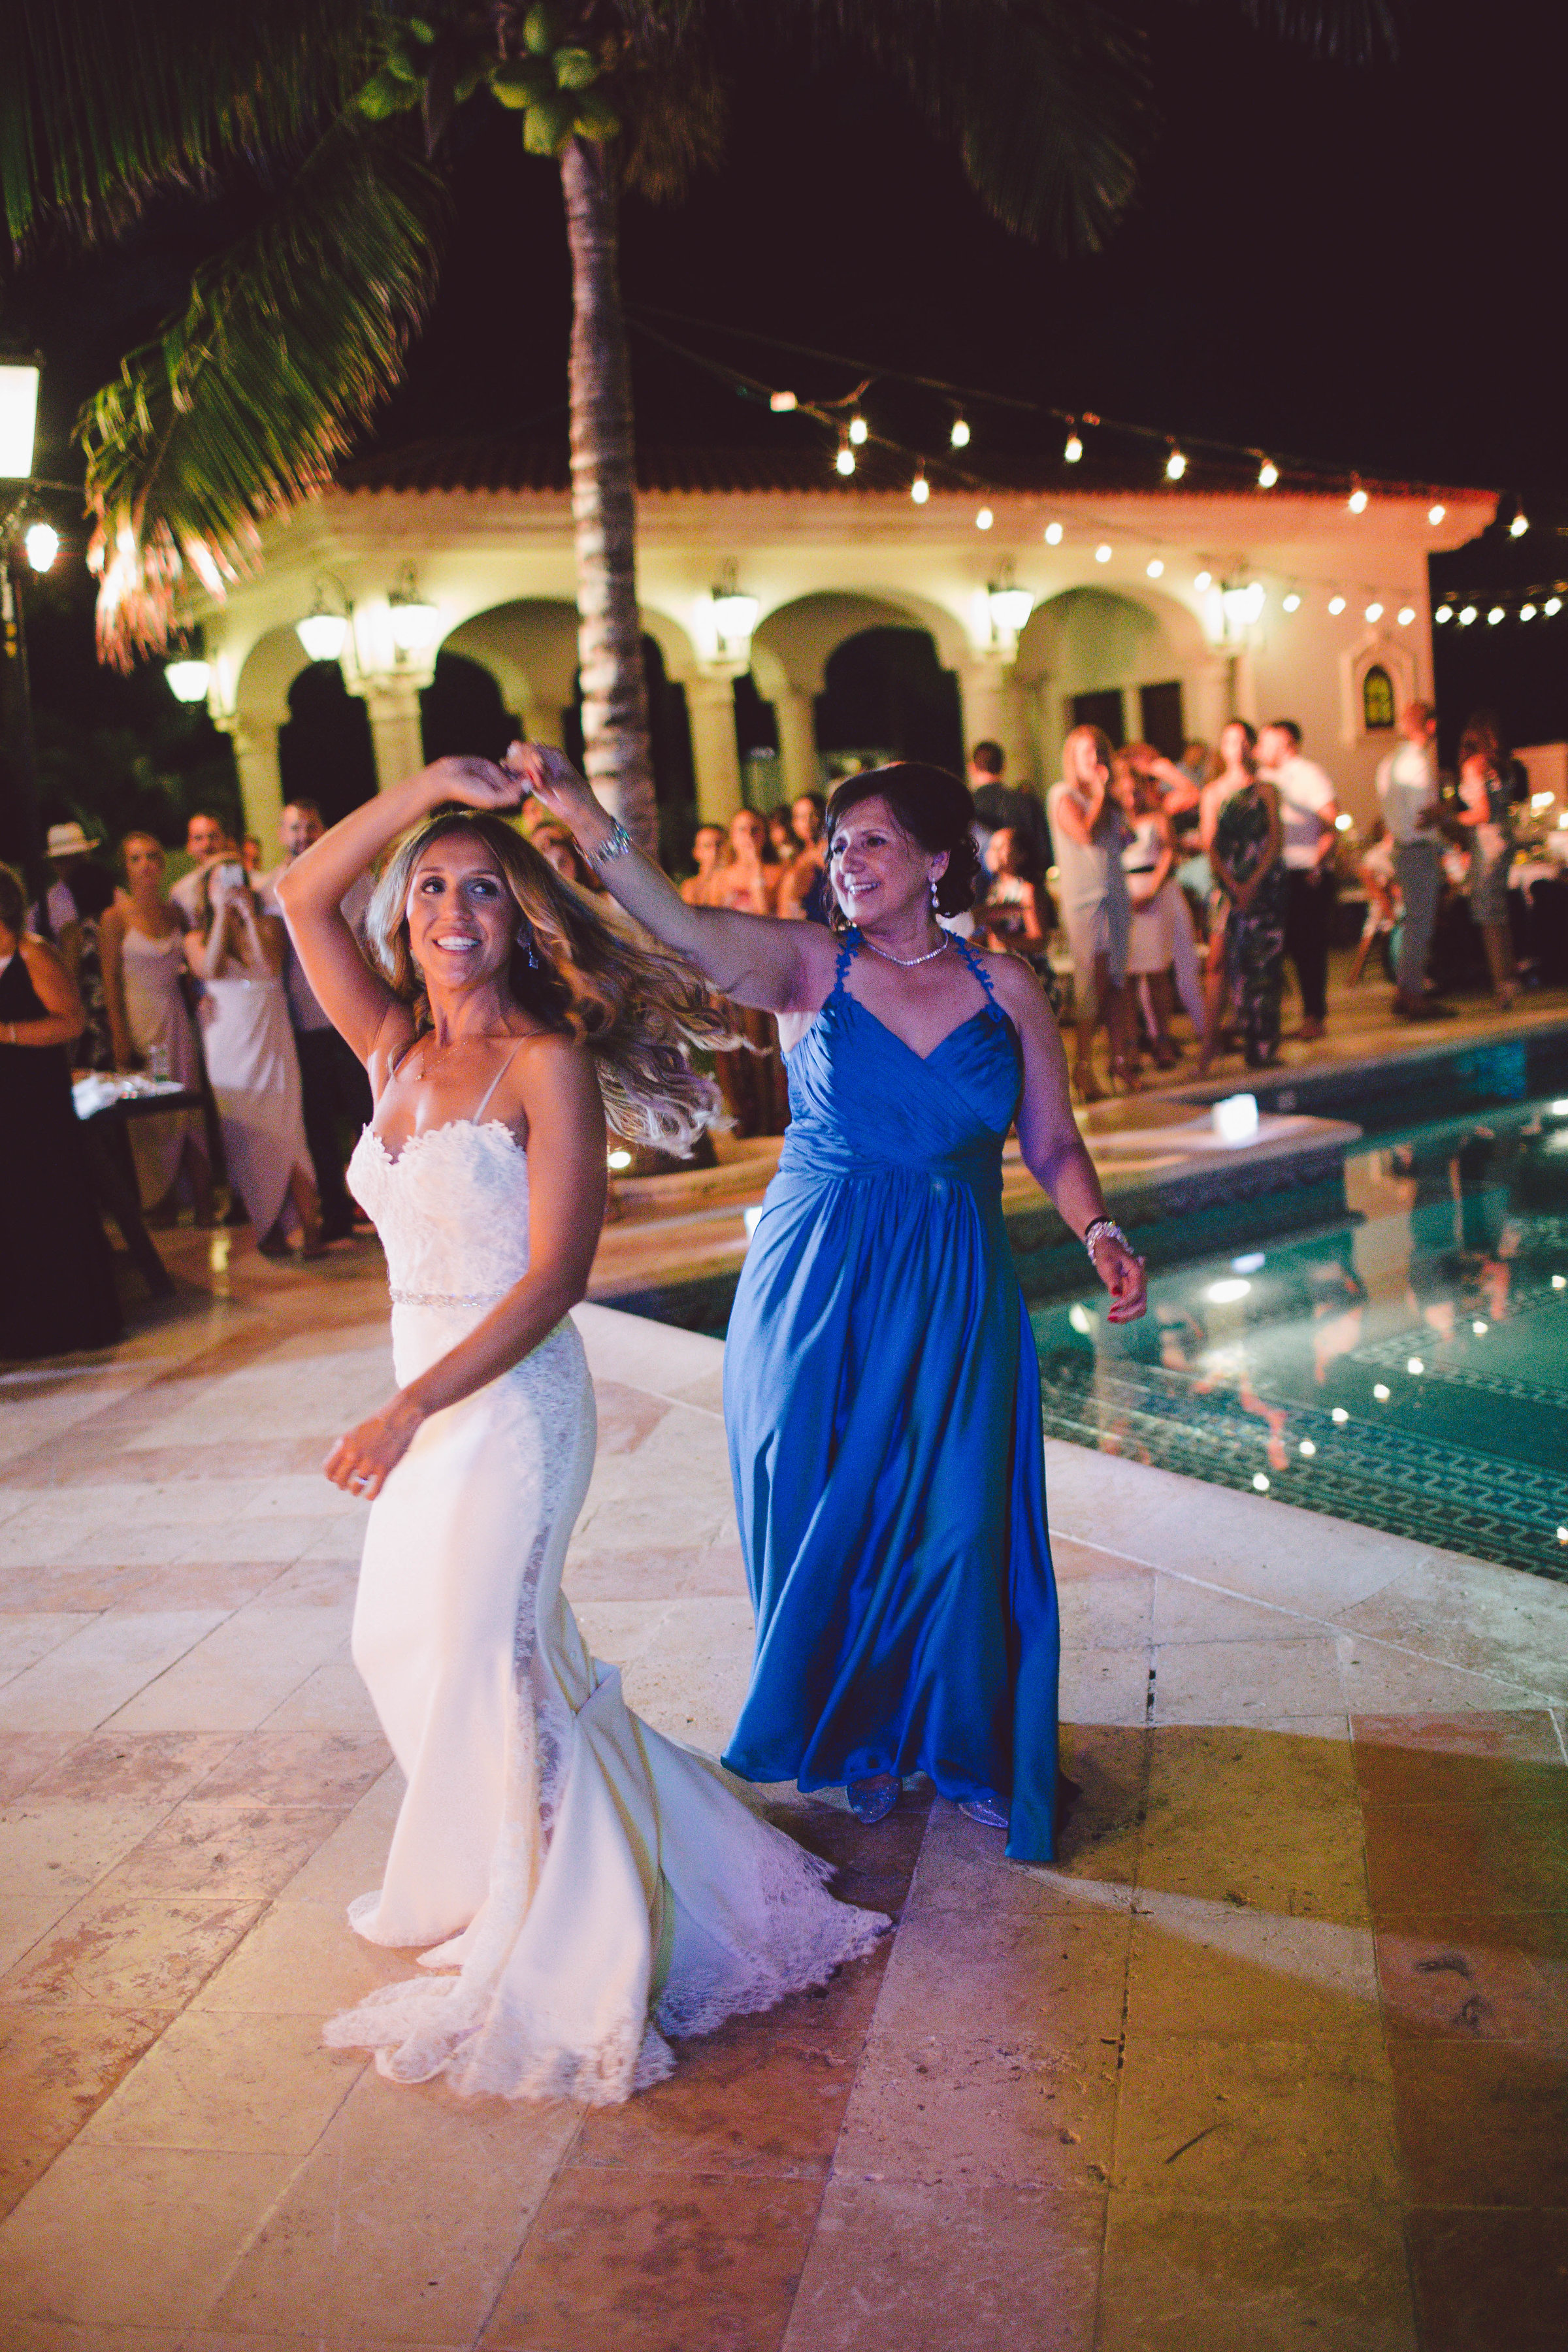 mexico_wedding_cancun_villa_la_joya_evangeline_lane_150a.jpg